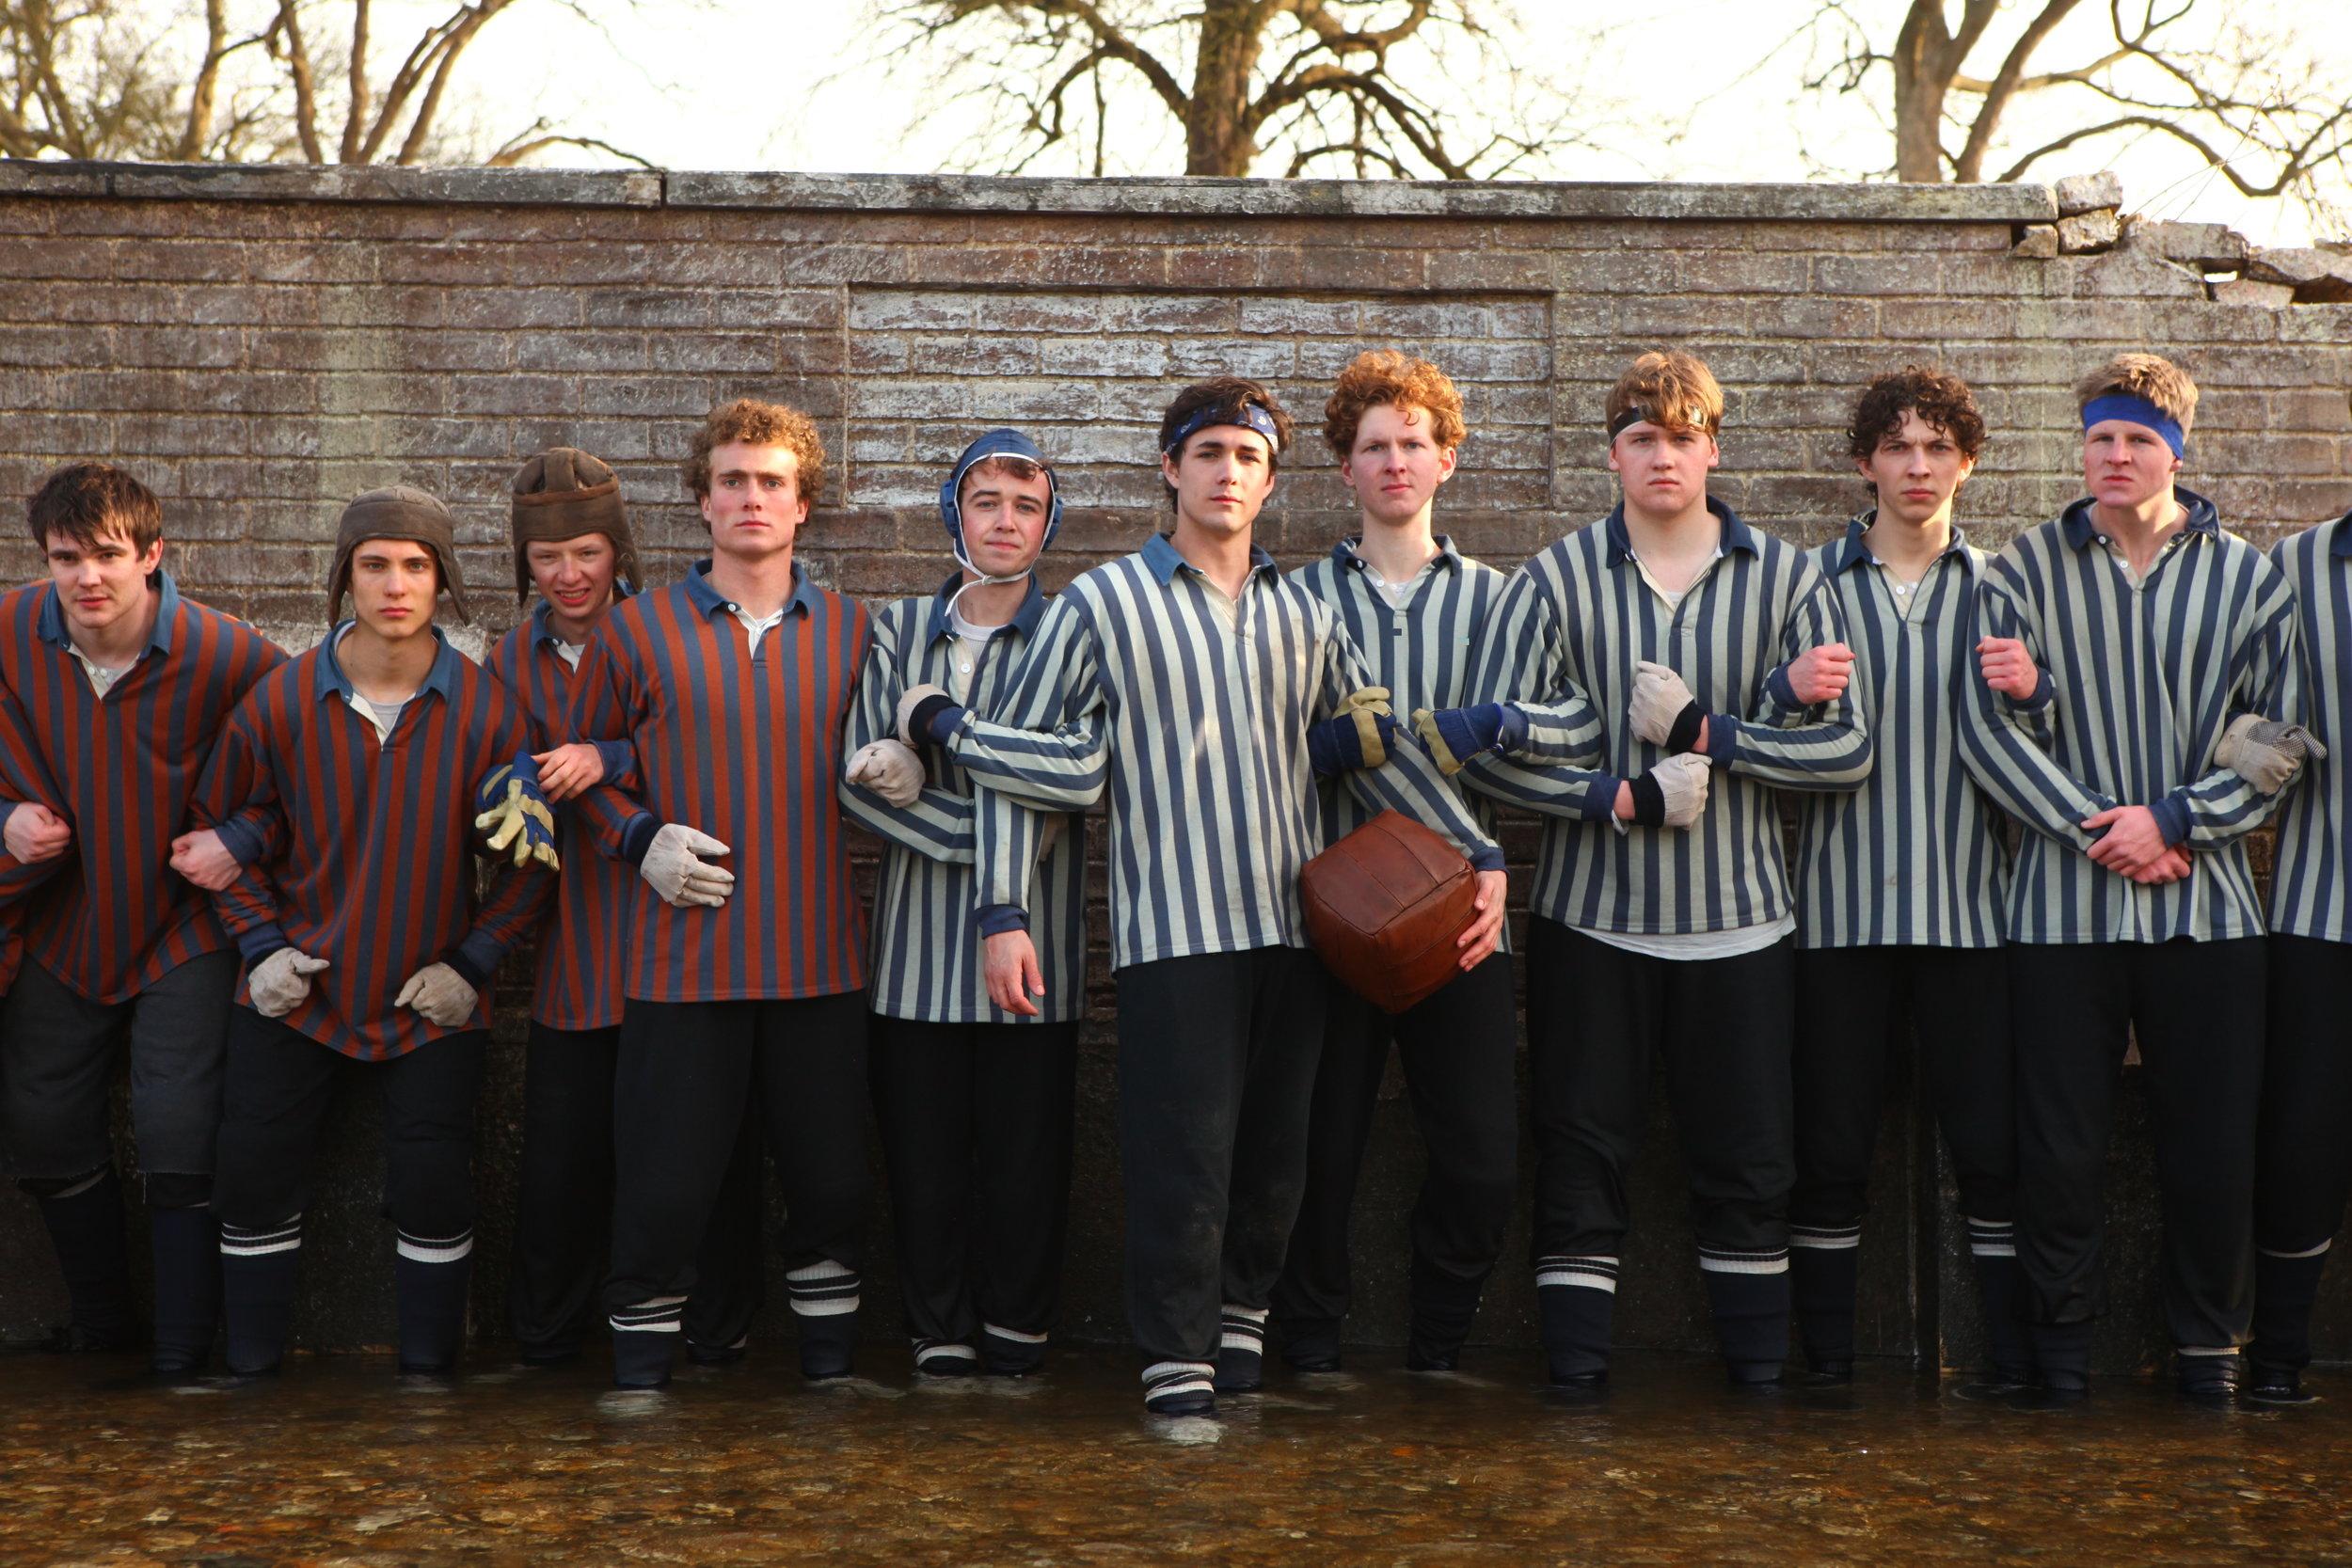 Old Boys  - Directed by Toby MacDonaldWritten by Luke Ponte, Freddy Syborn.Coming Soon